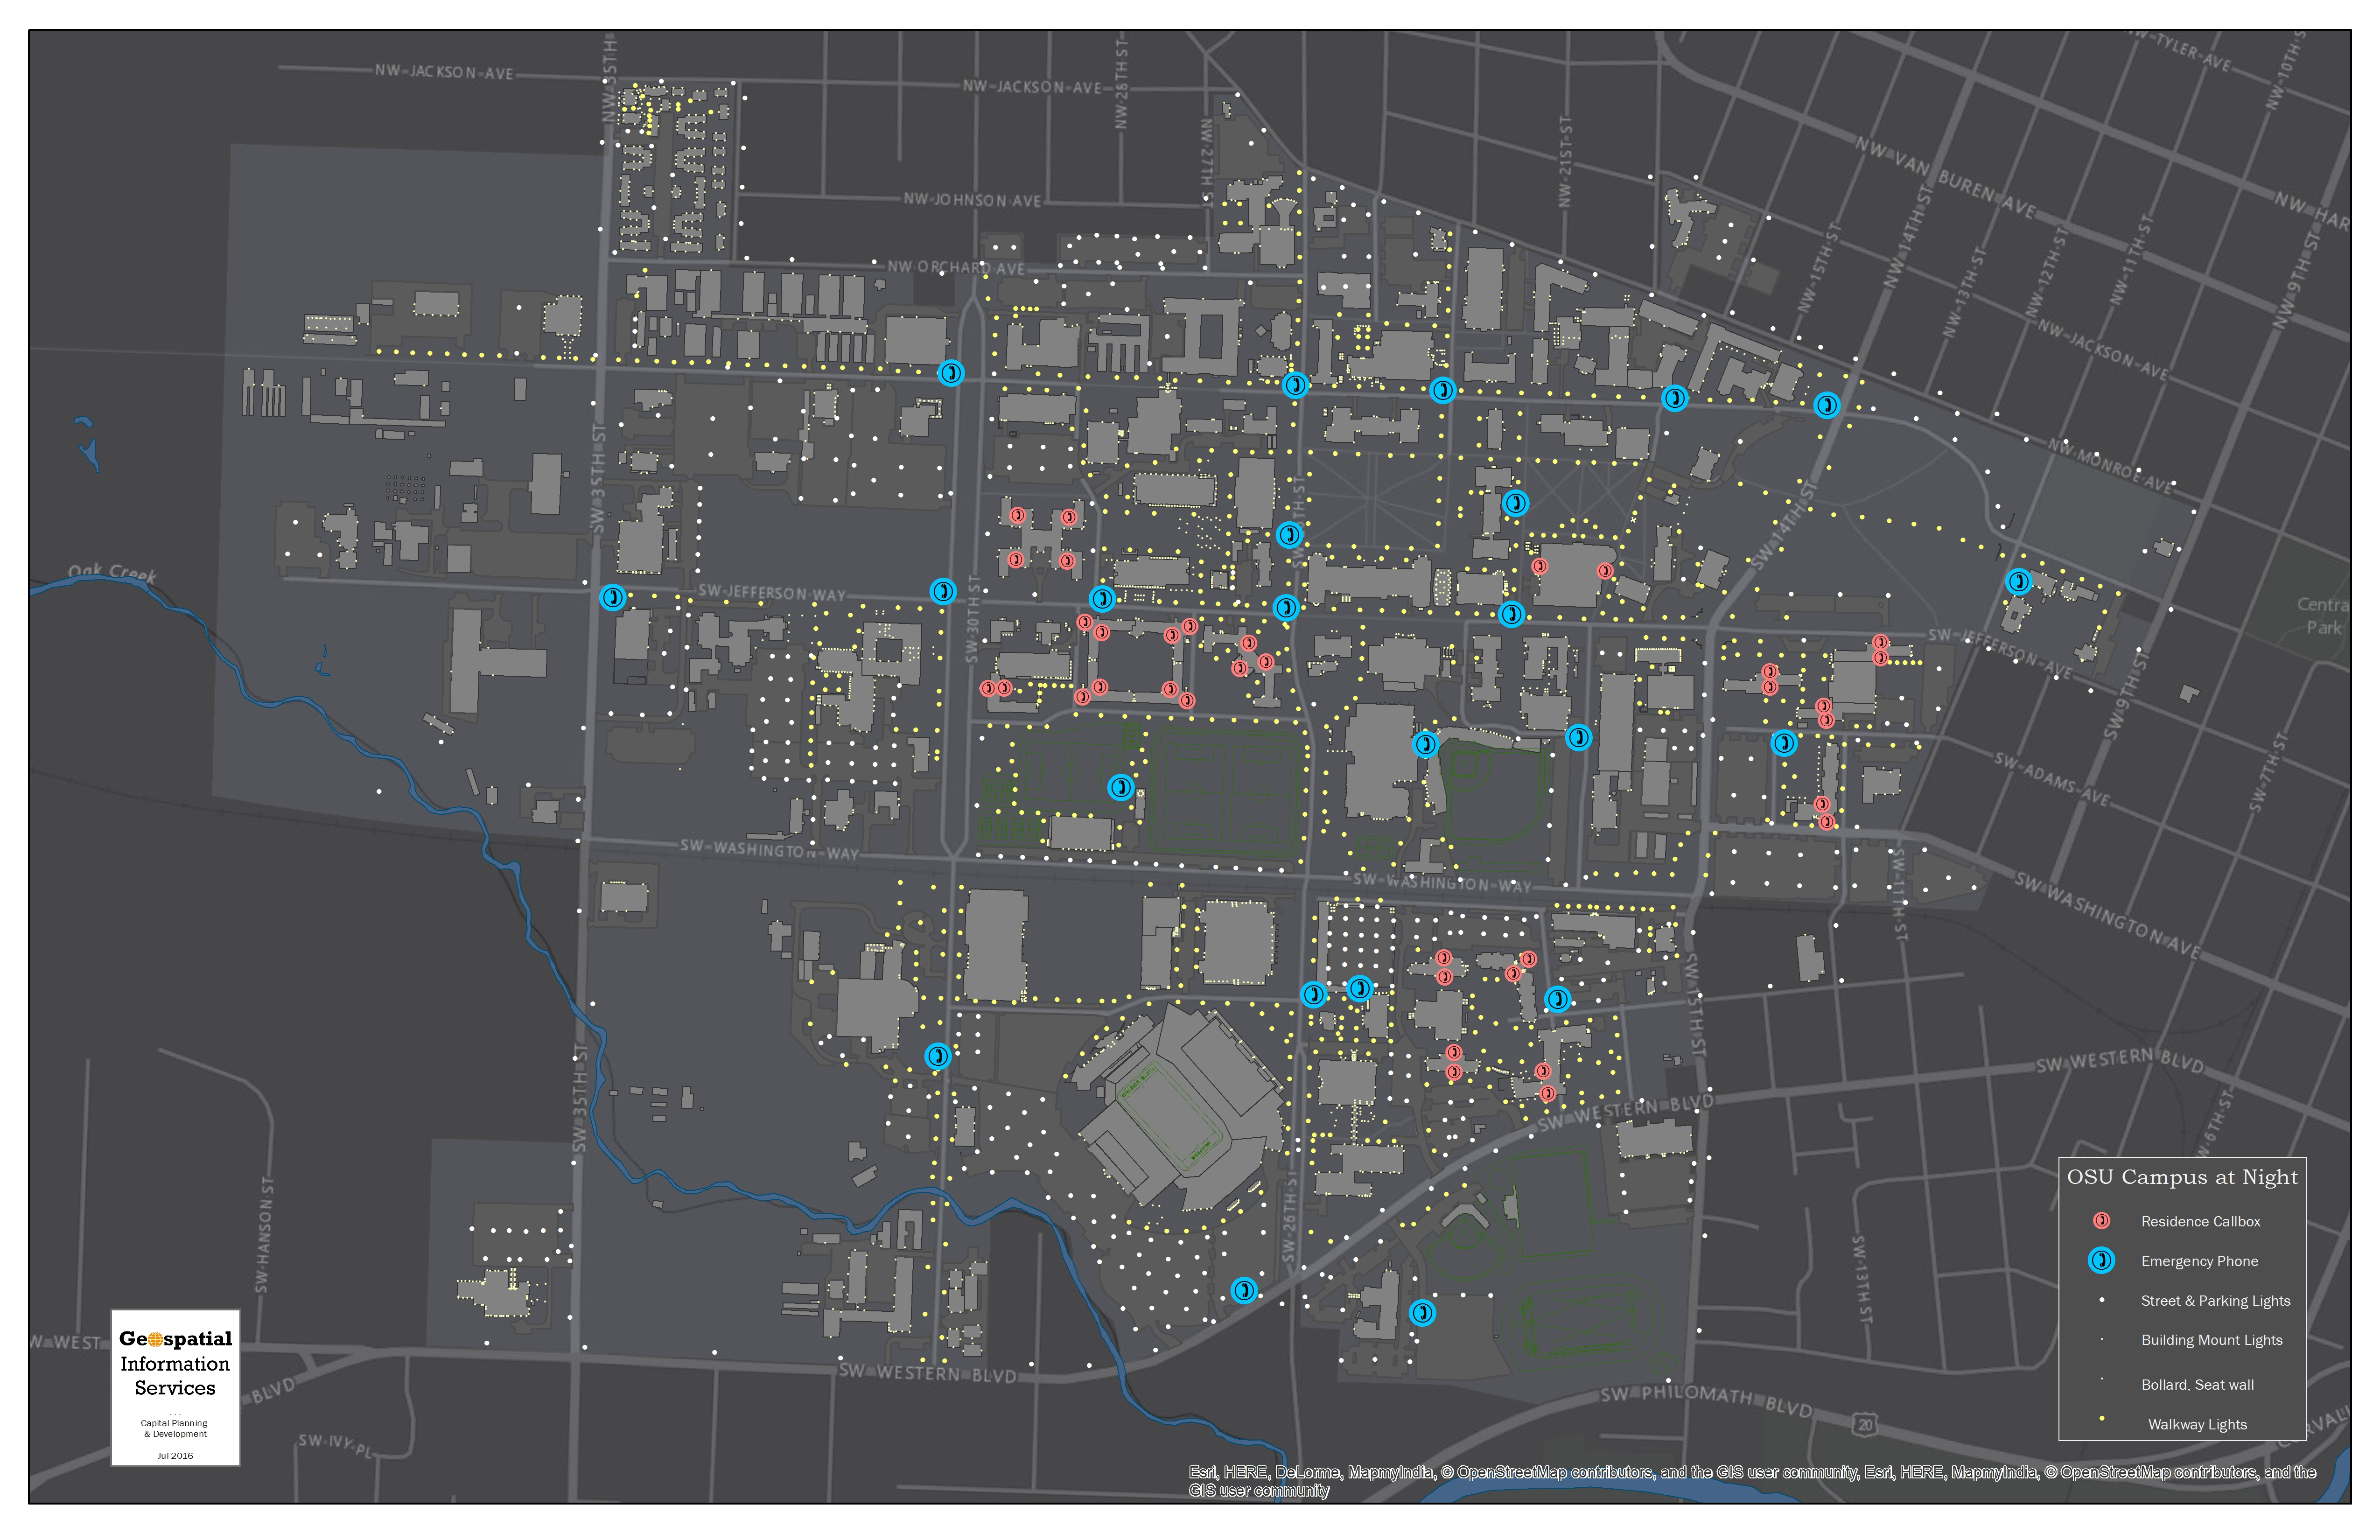 campus at Night map